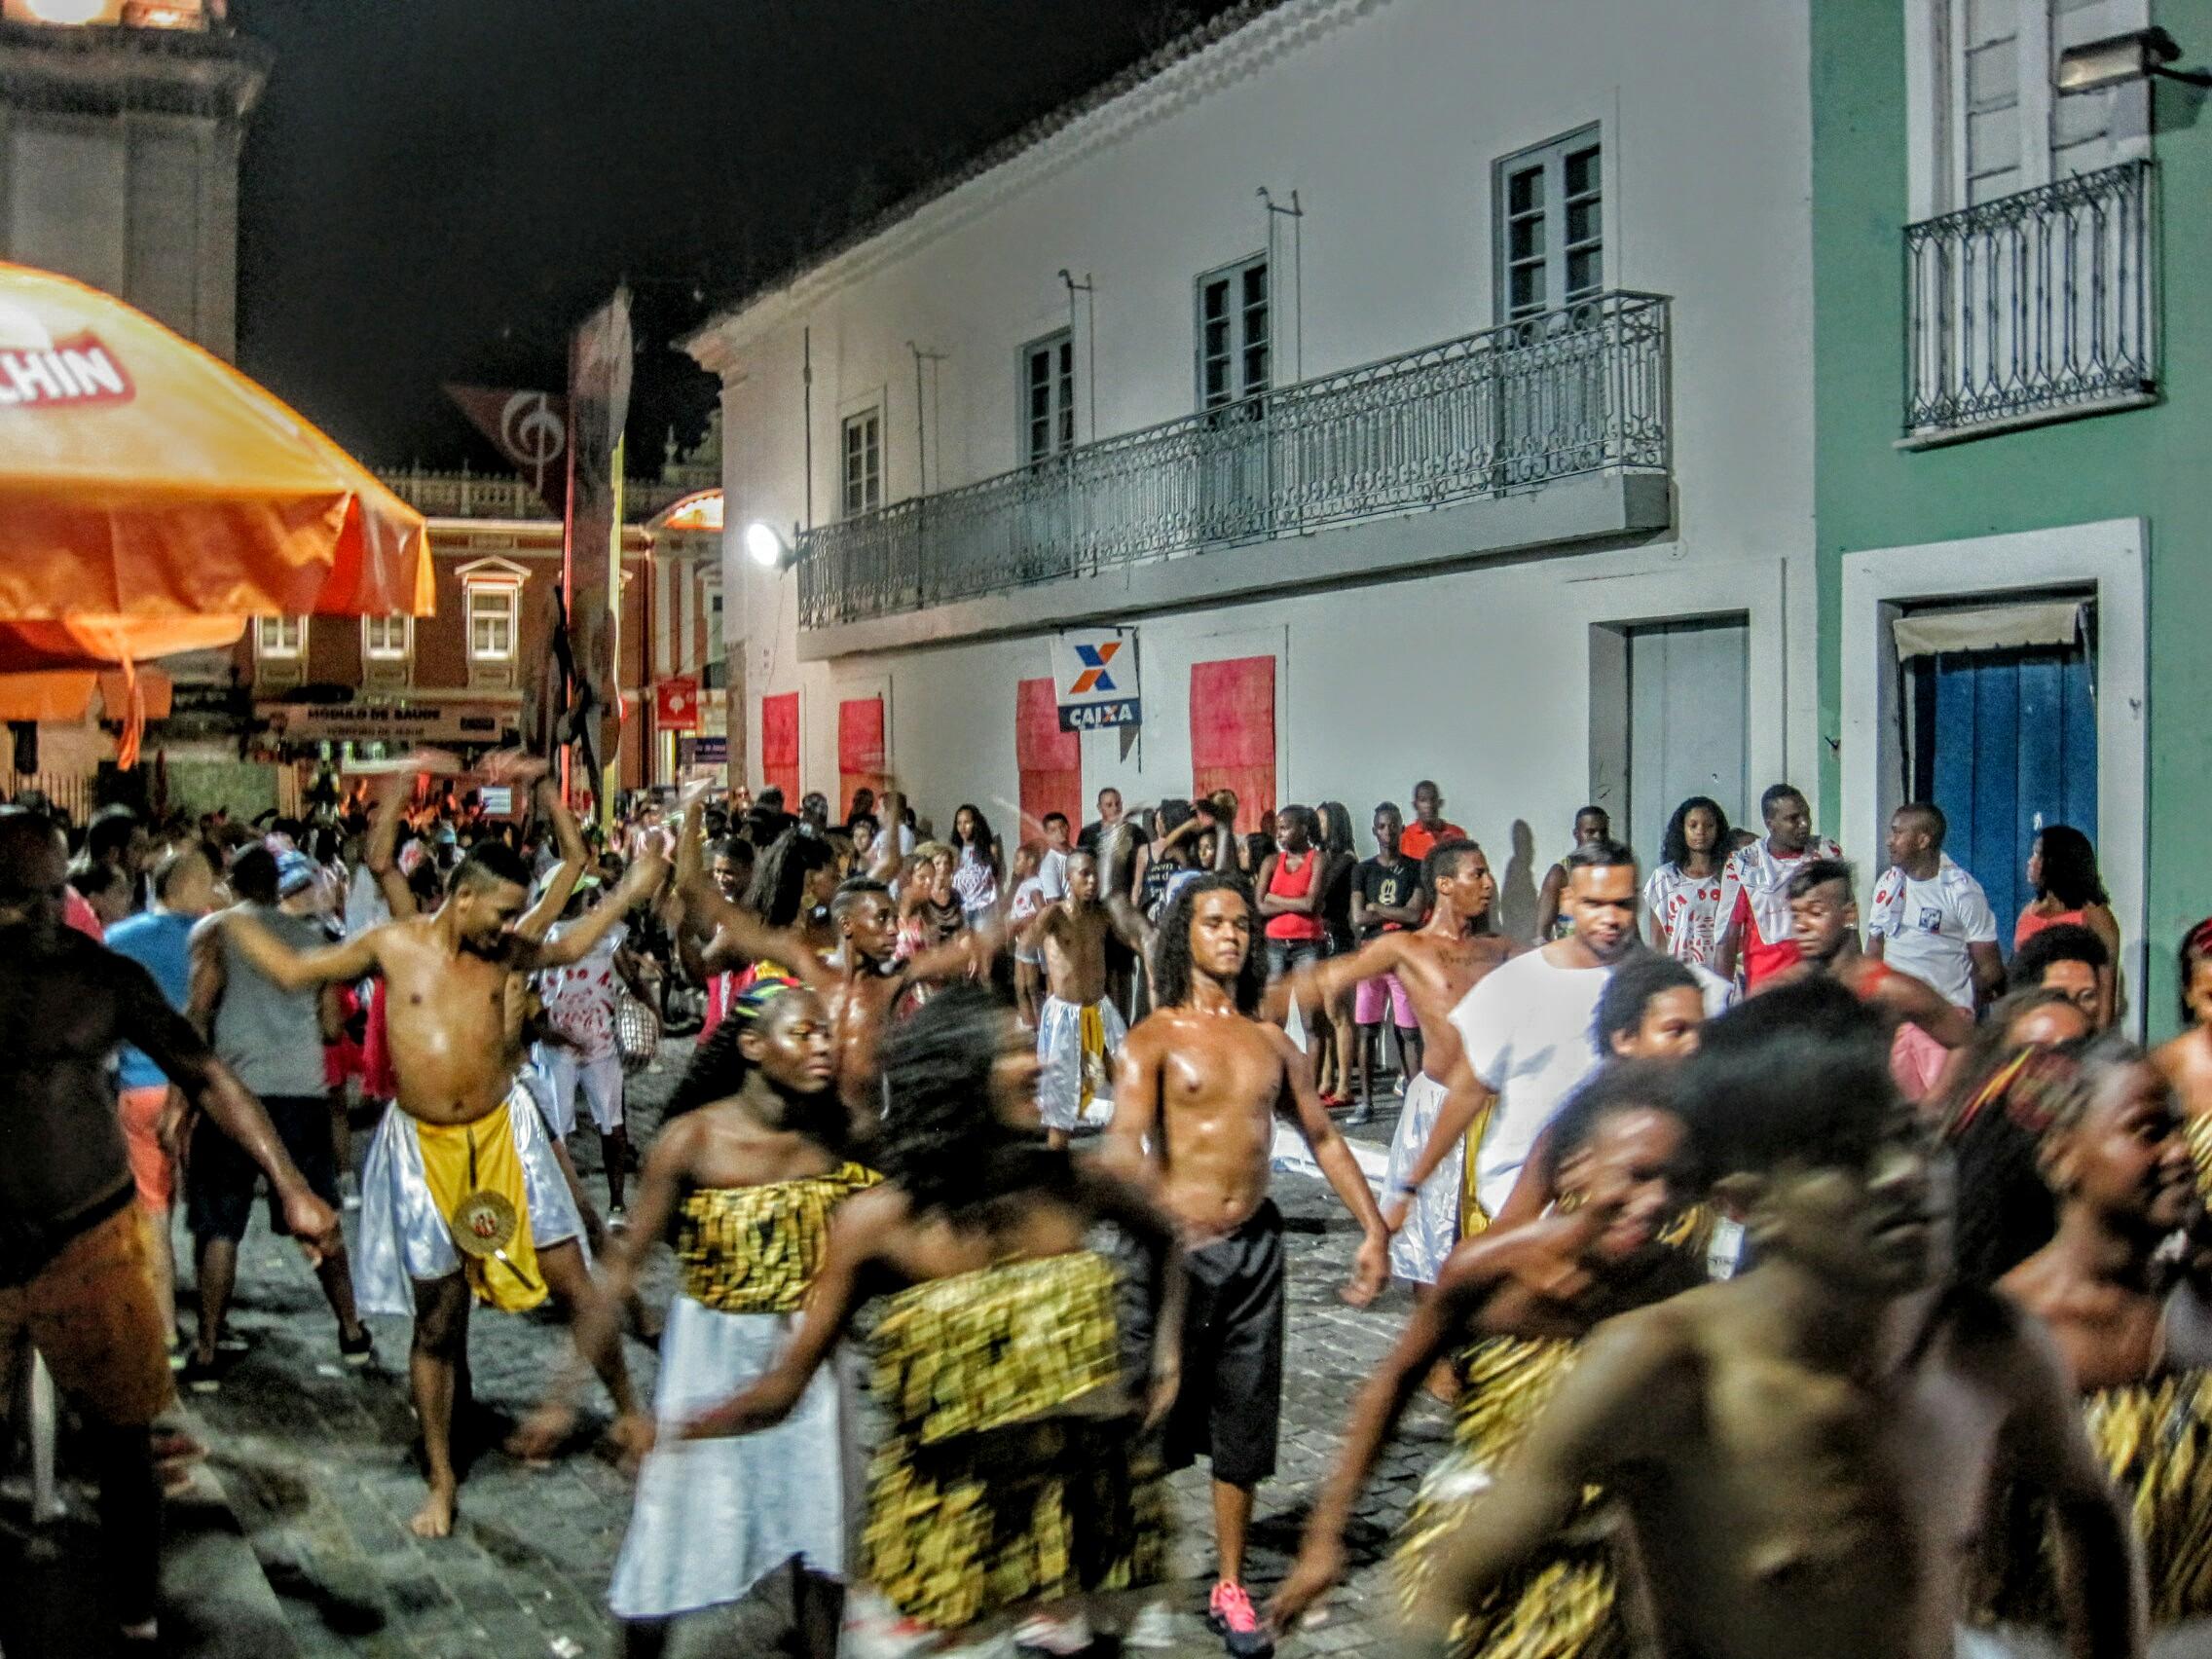 Dancers in the Pelerinho Carnaval Salvador Bahia